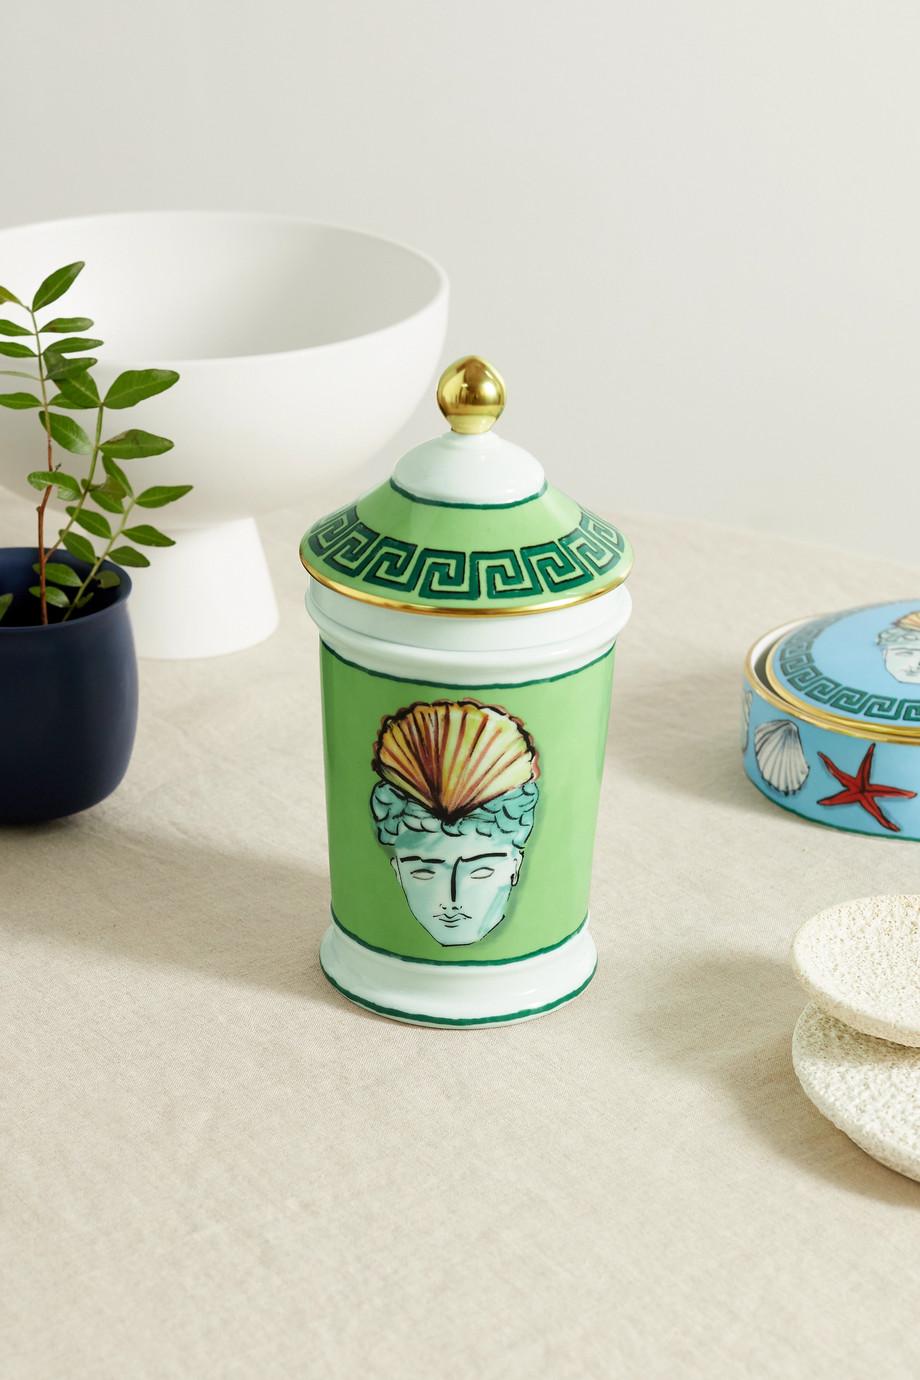 Ginori Pot d'apothicaire en porcelaine peinte plaquée or Viaggio di Nettuno x Luke Edward Hall